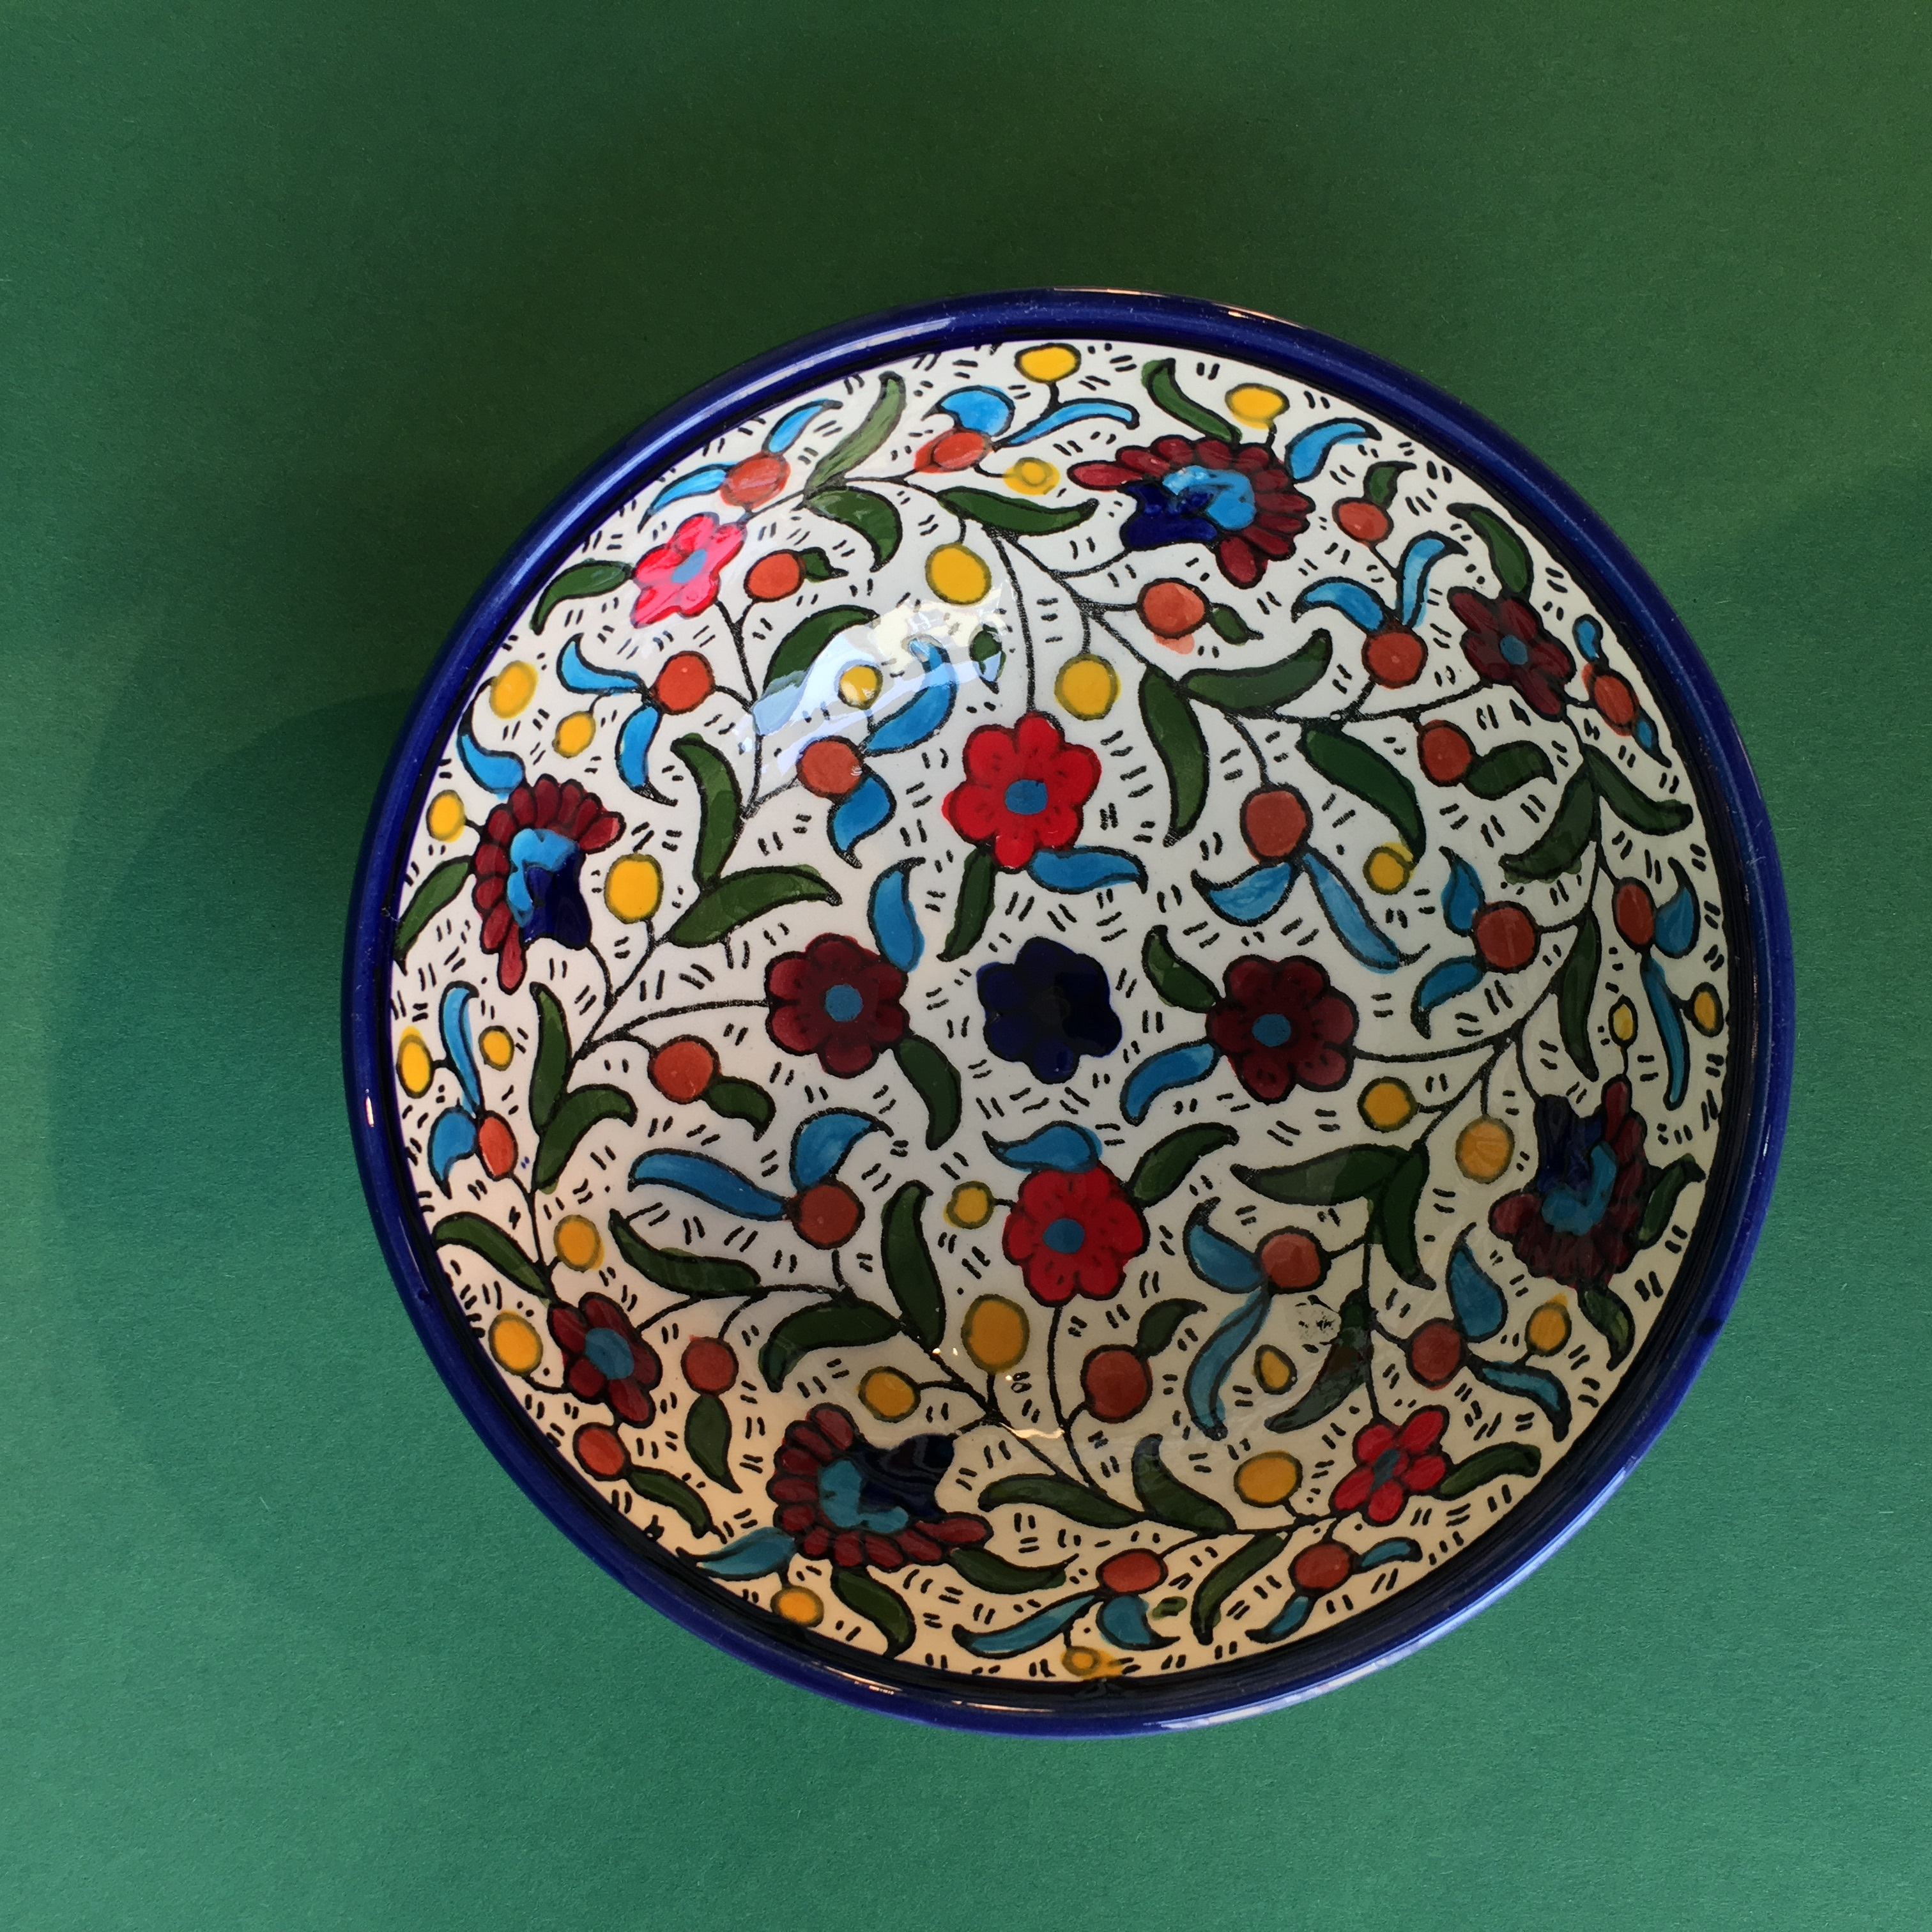 Mellomstor keramikkskål, flerfarget